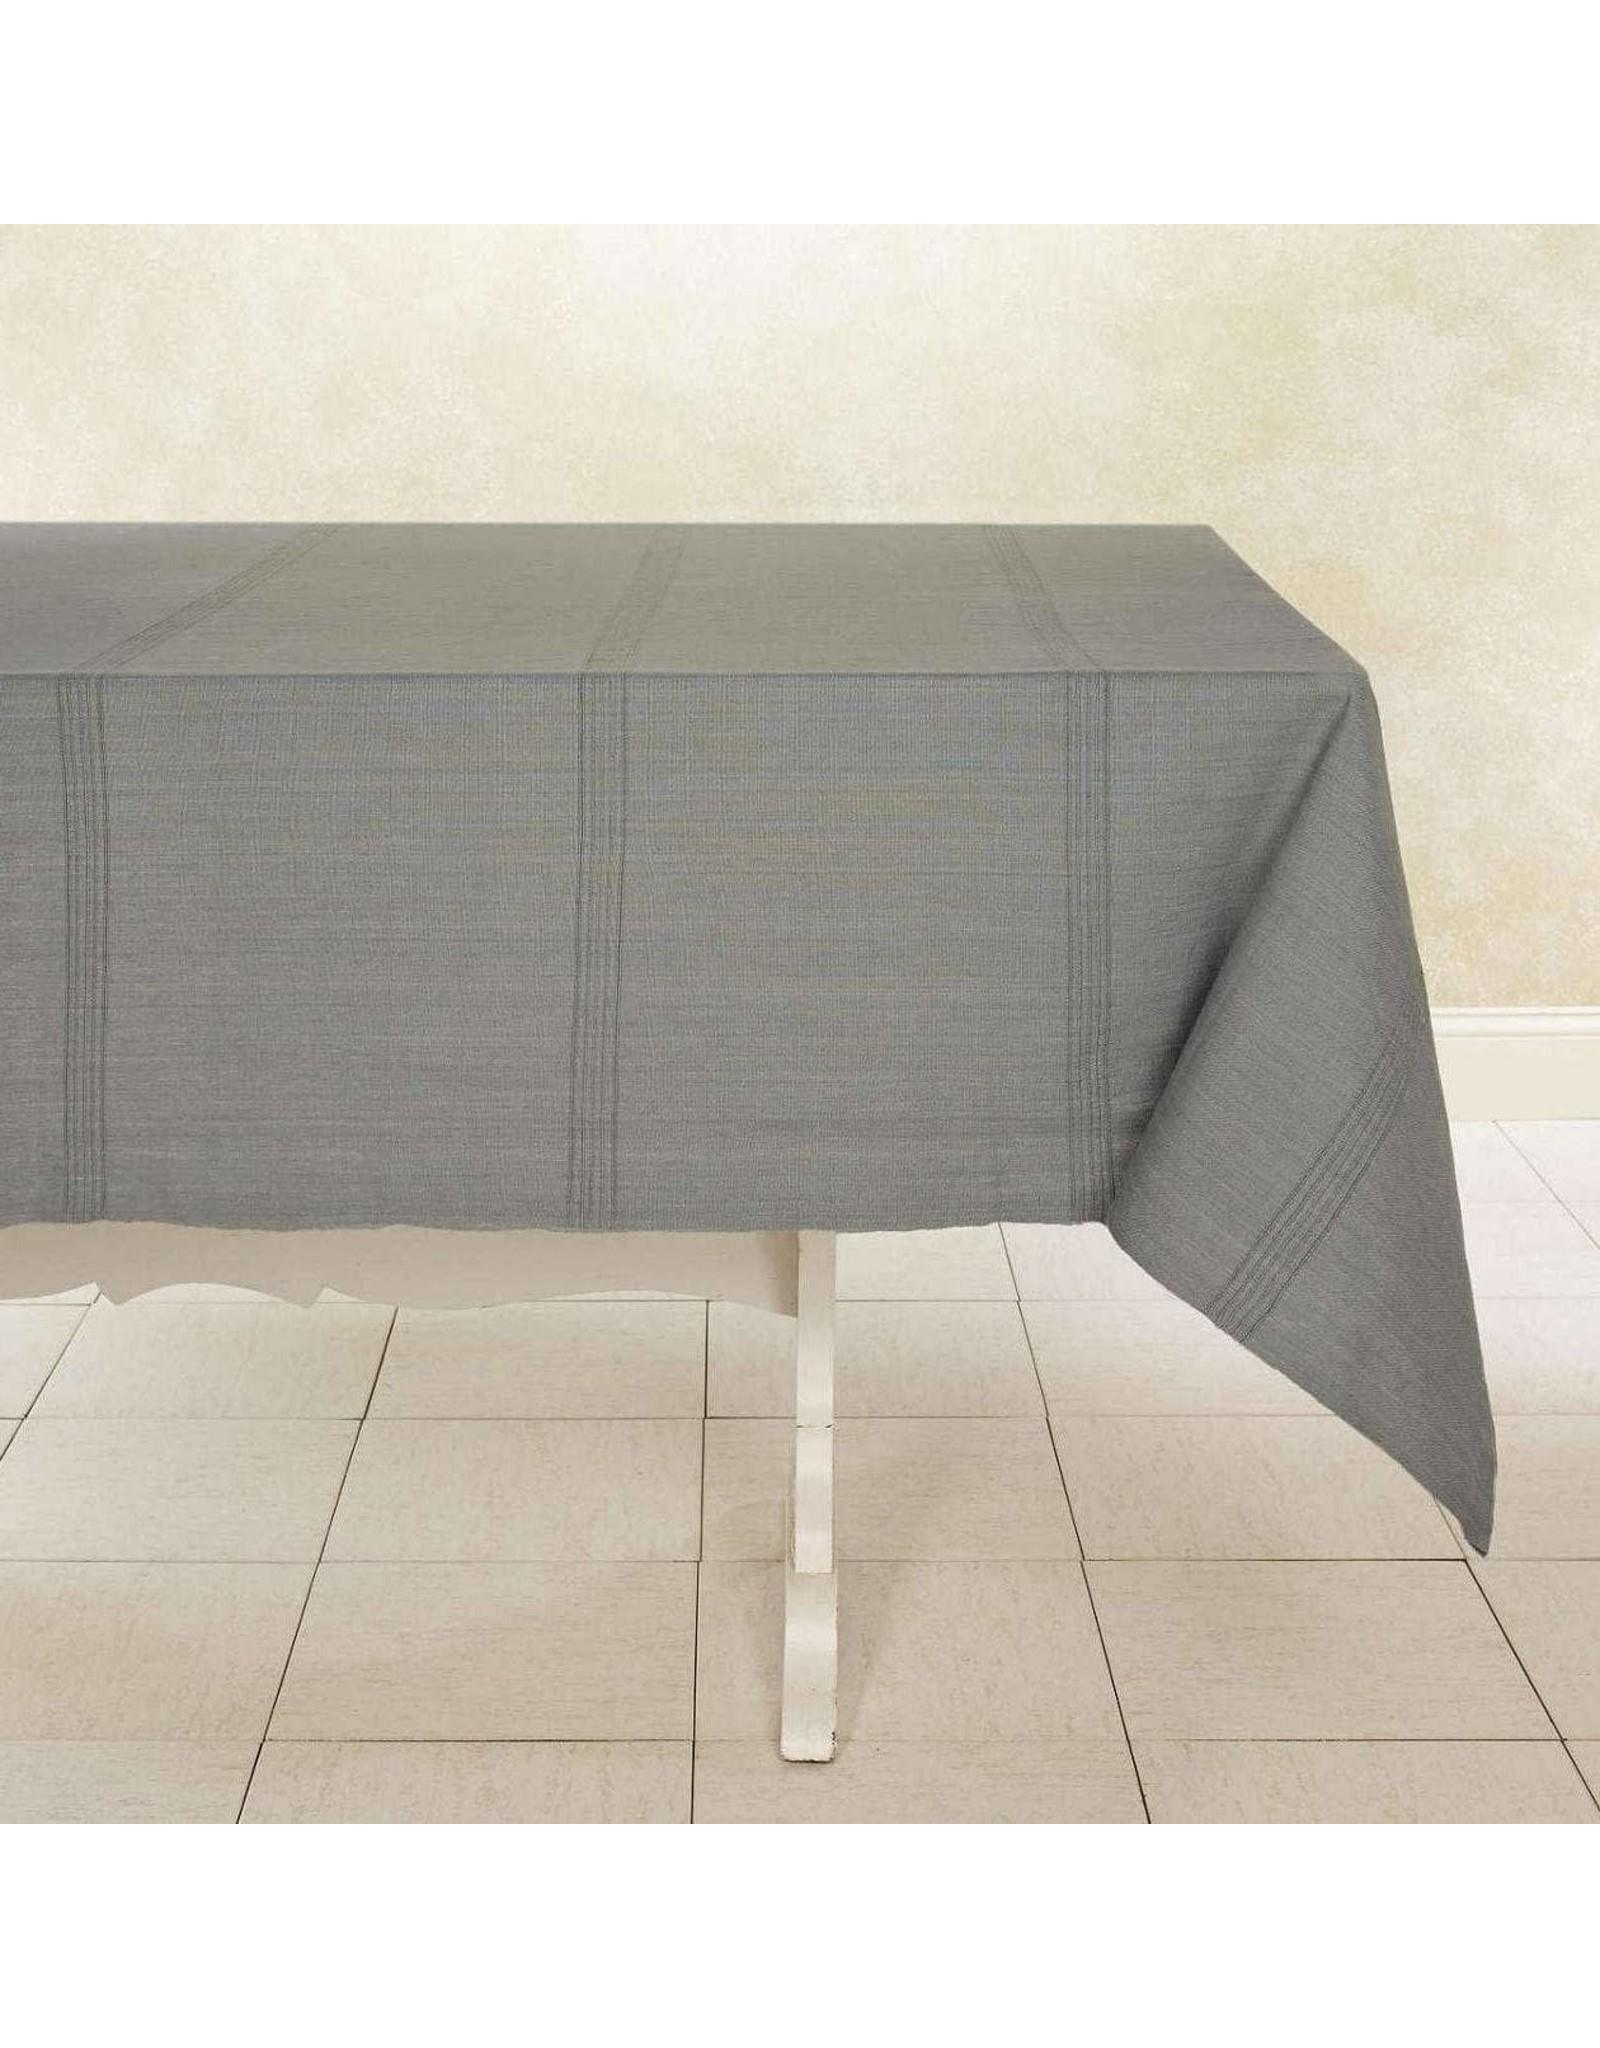 "Woven Cotton Tablecloth 90""x 60"" Mushroom, India"